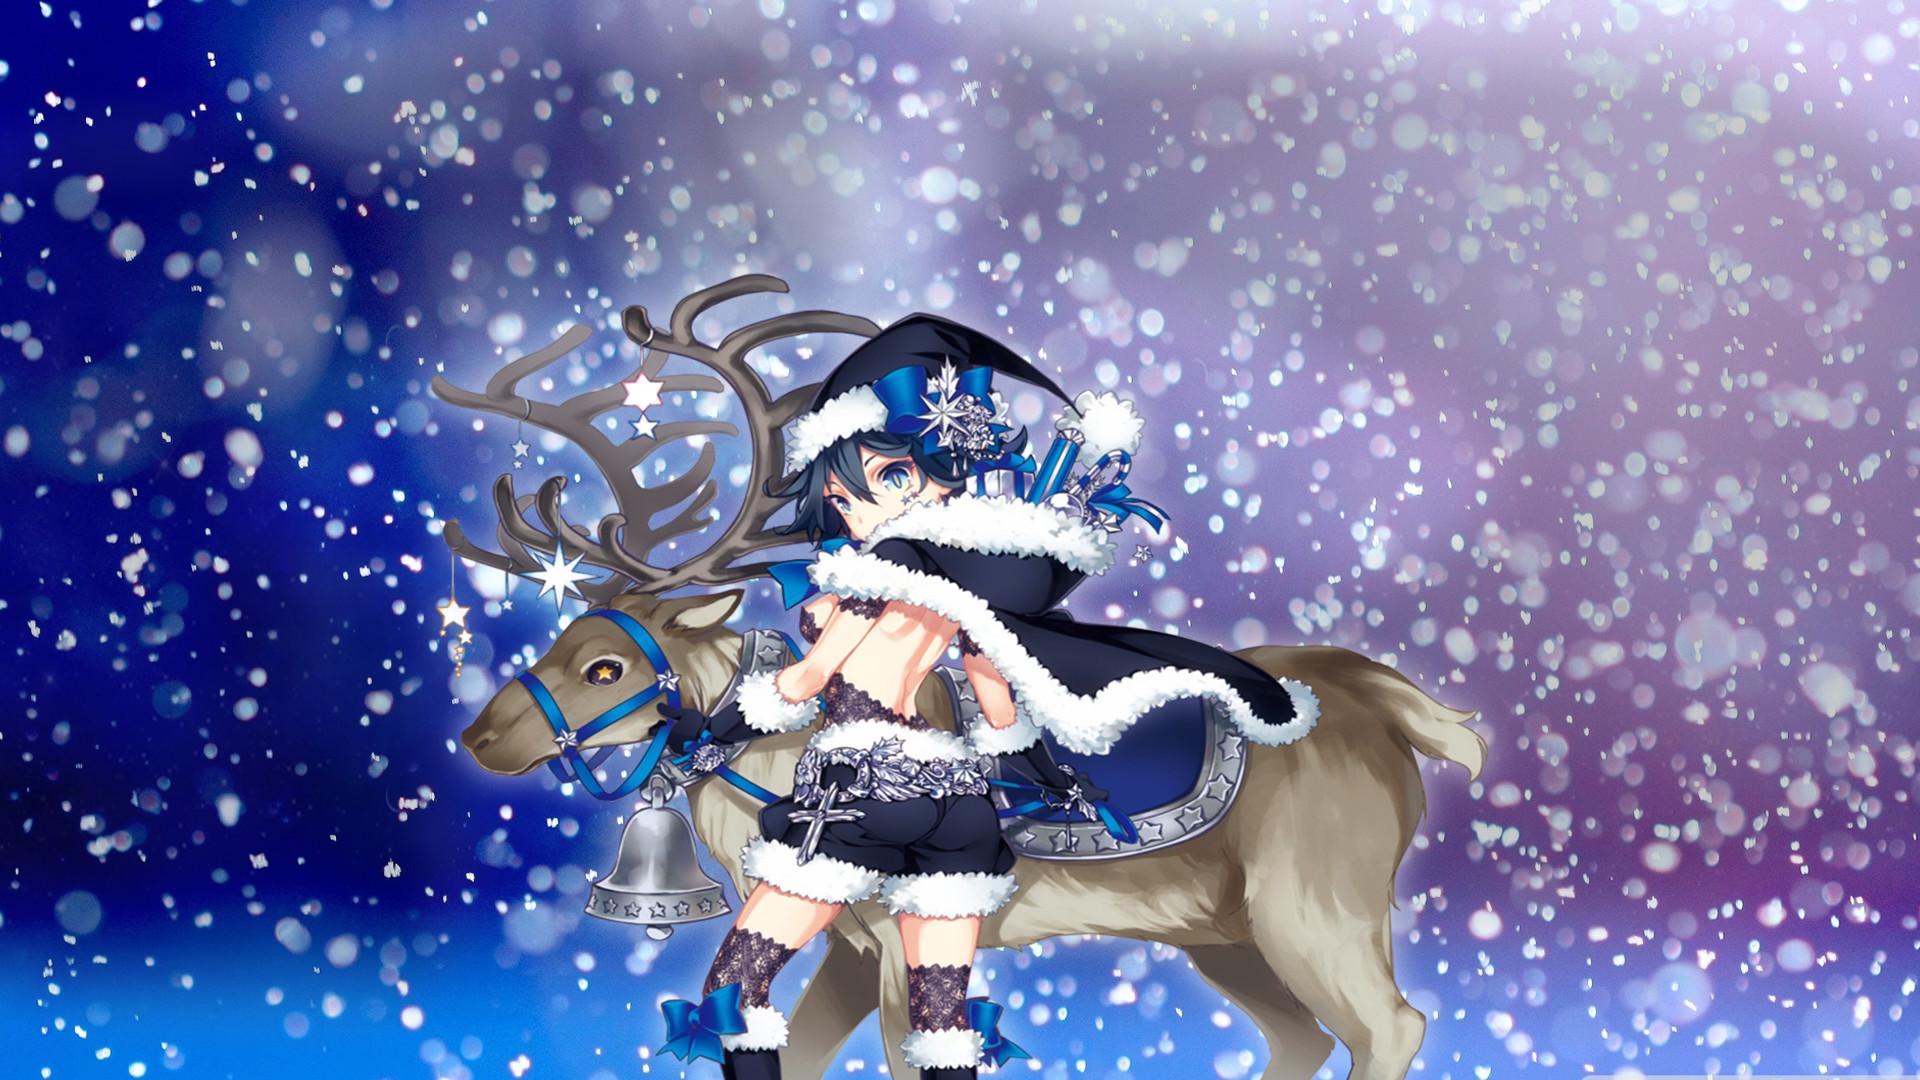 Blue Anime Girl Christmas Wallpaper by callmeteddy24 Blue Anime Girl Christmas  Wallpaper by callmeteddy24